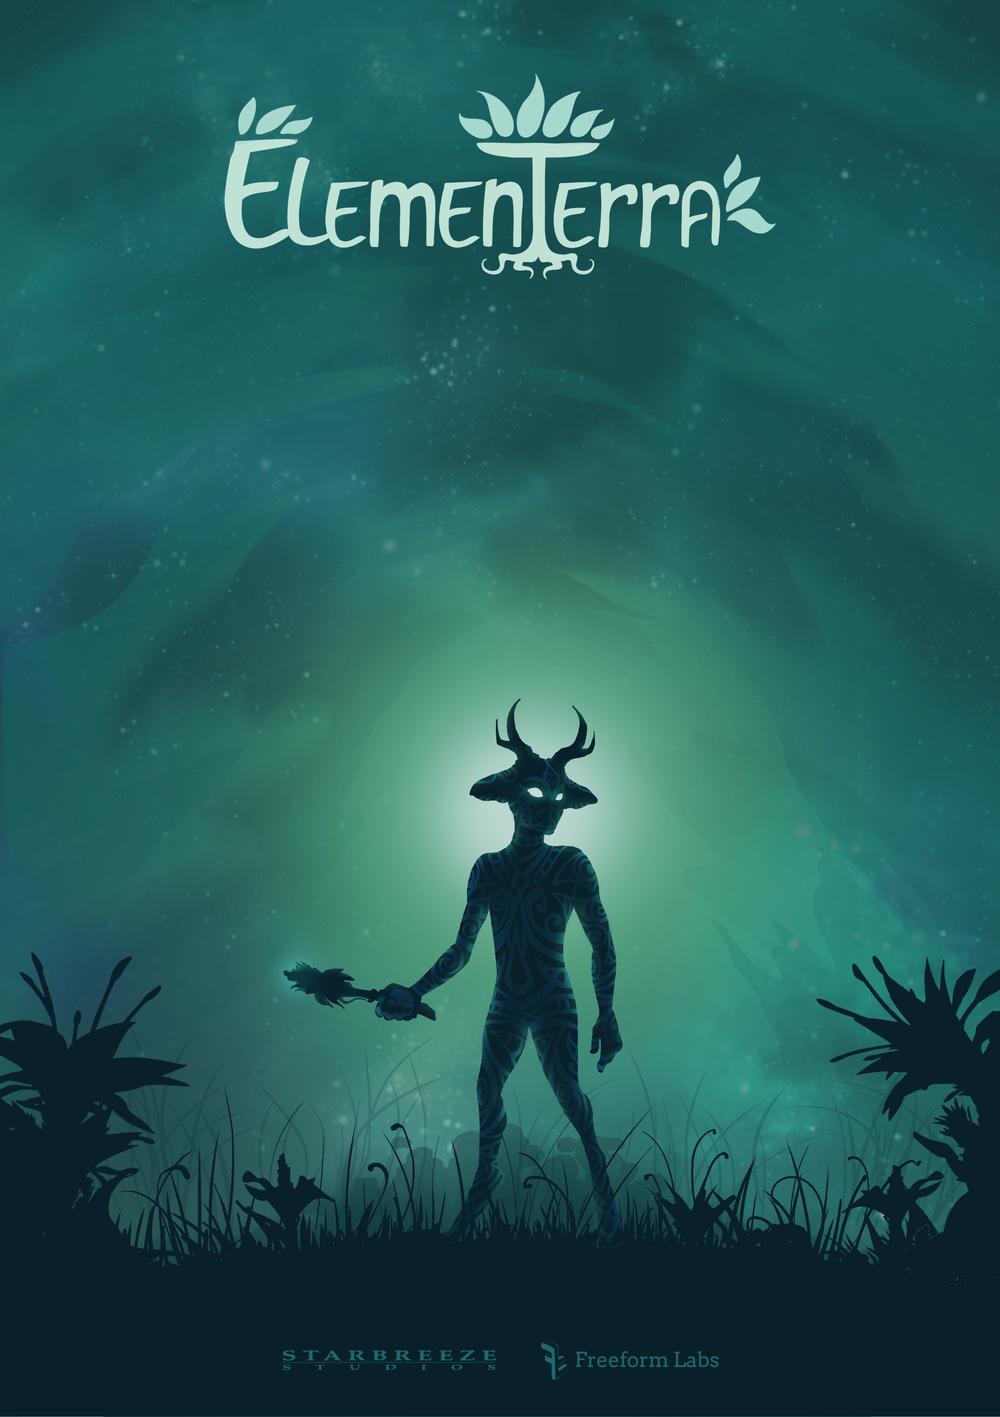 elementerra-poster-2016